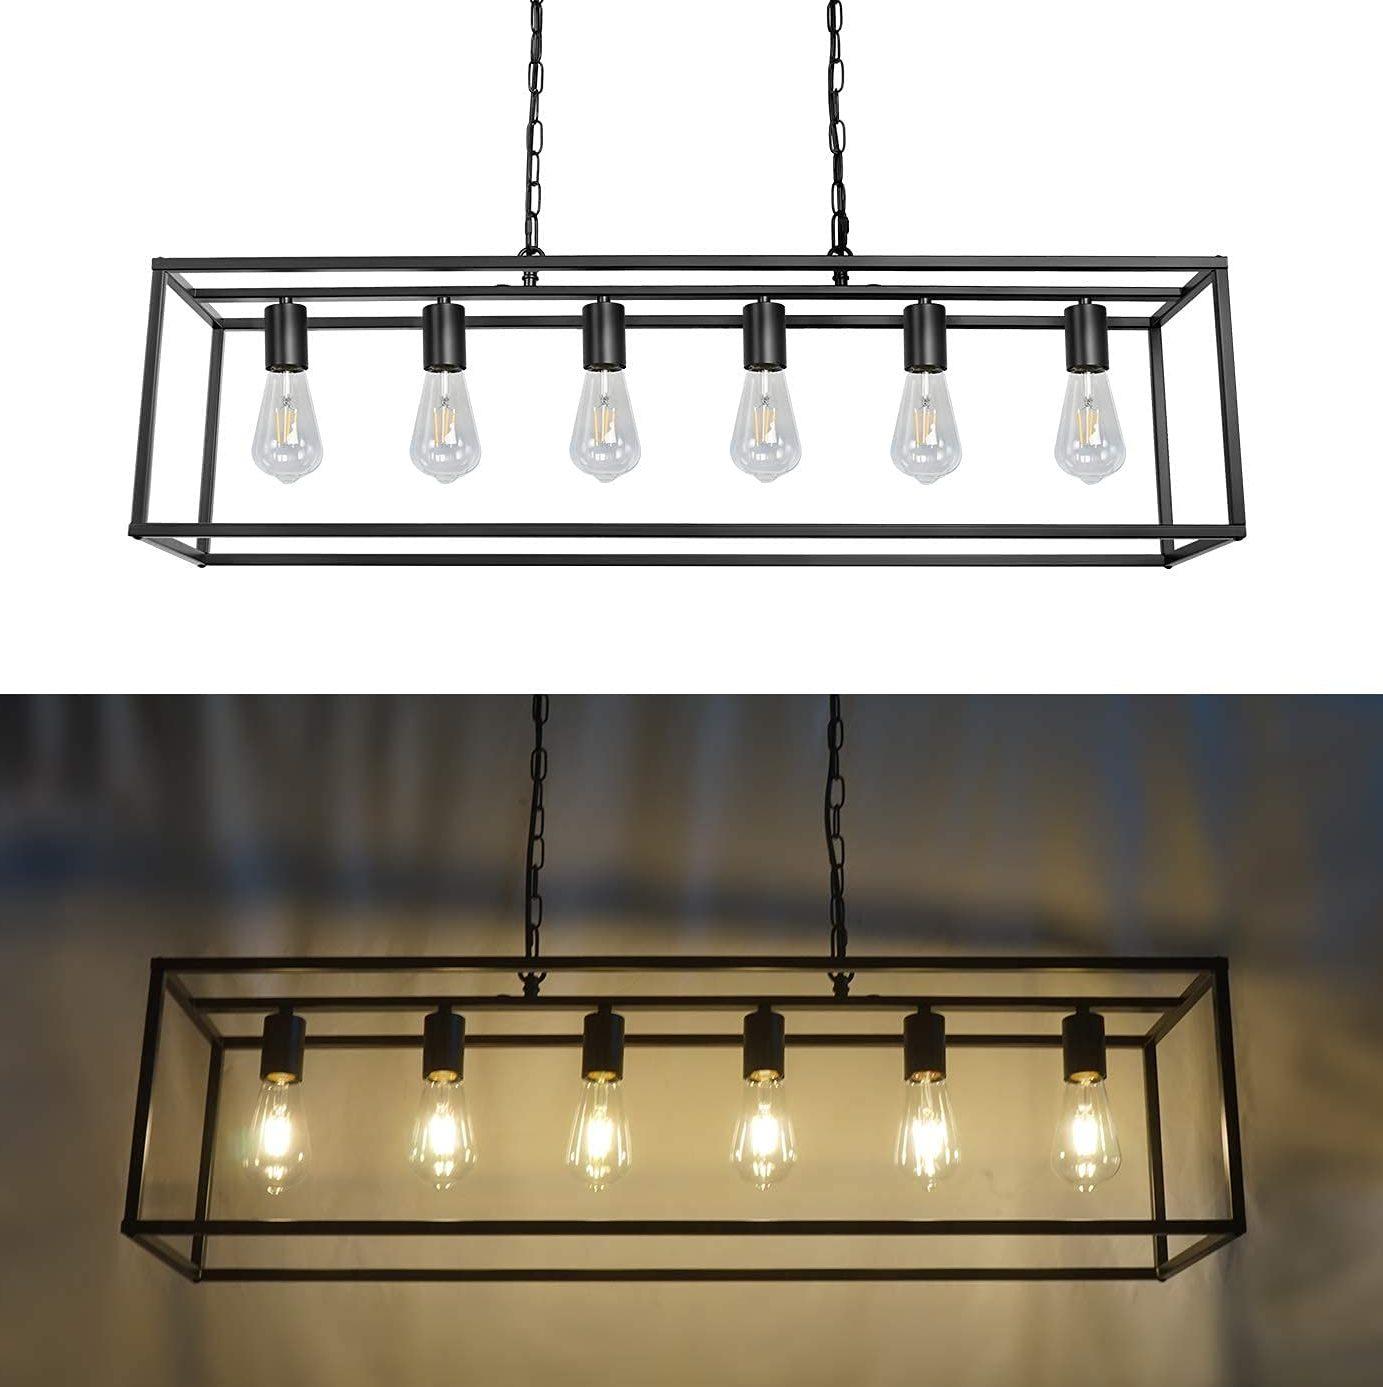 6-Light Modern Black Farmhouse Industrial Chandelier Light Fixtures